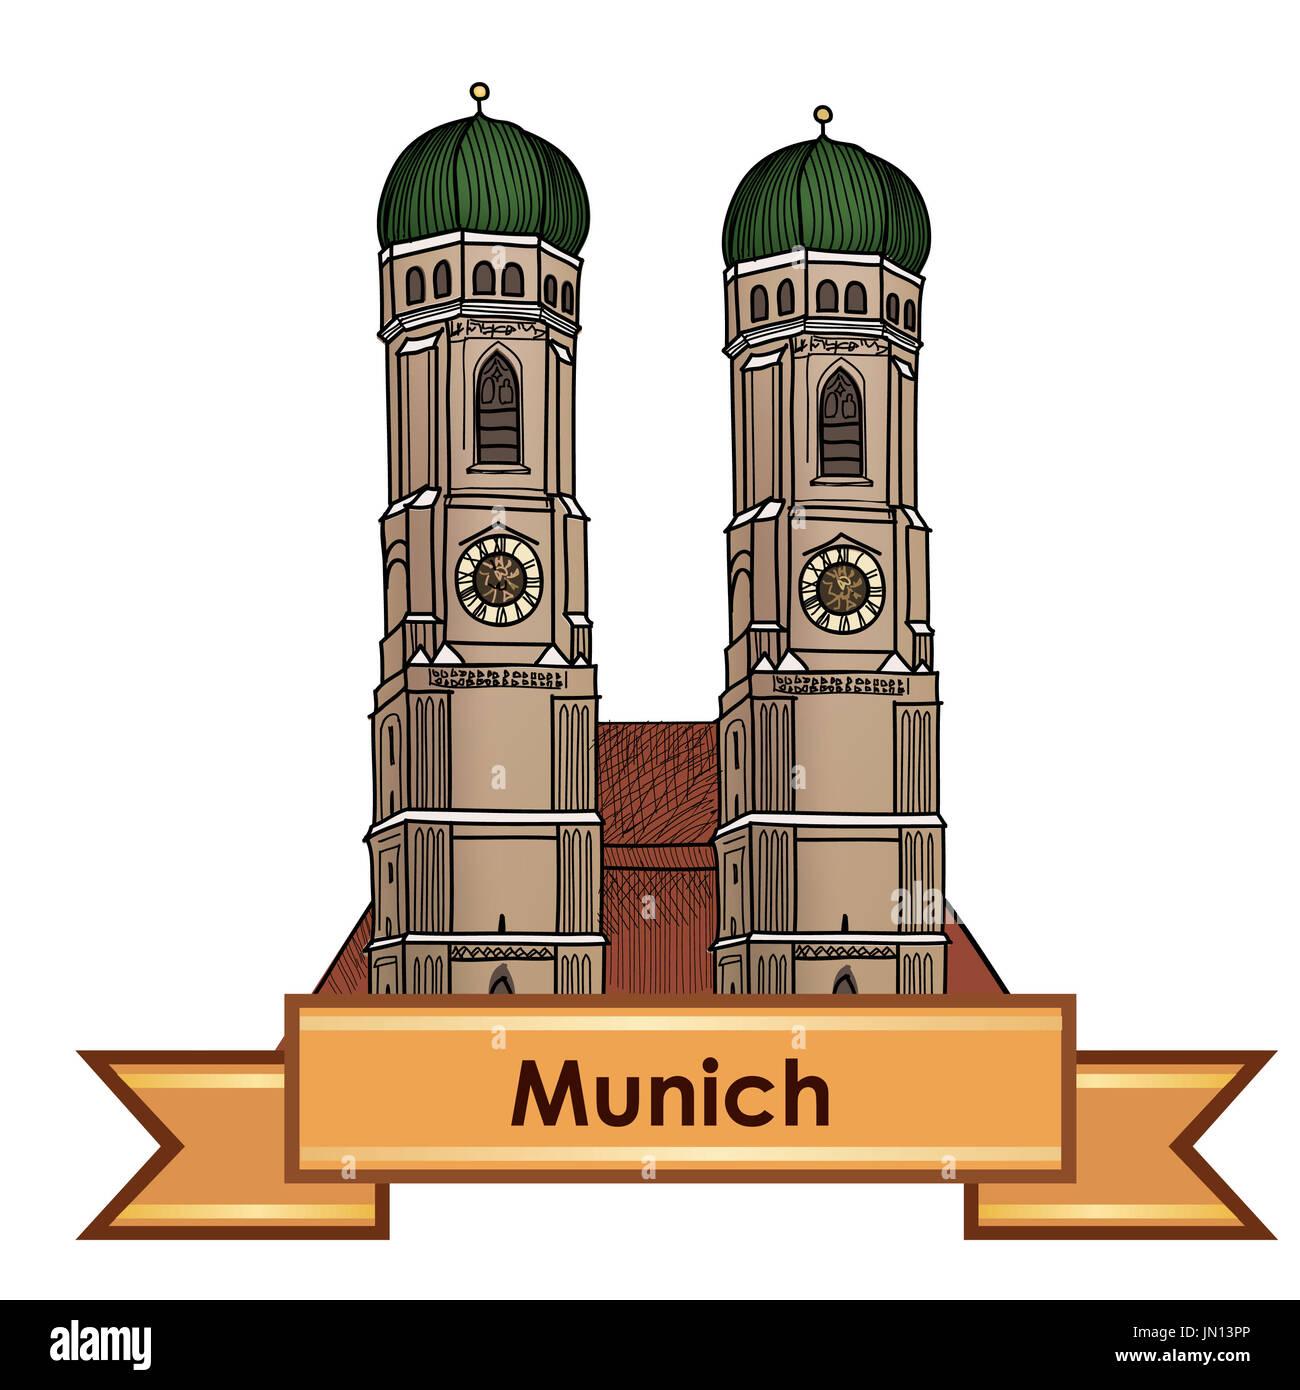 Munich city label. Munich Cathedral, Liebfrauenkirche in Munich/ Travel Germany emblem. Bavaria capital sign. - Stock Image